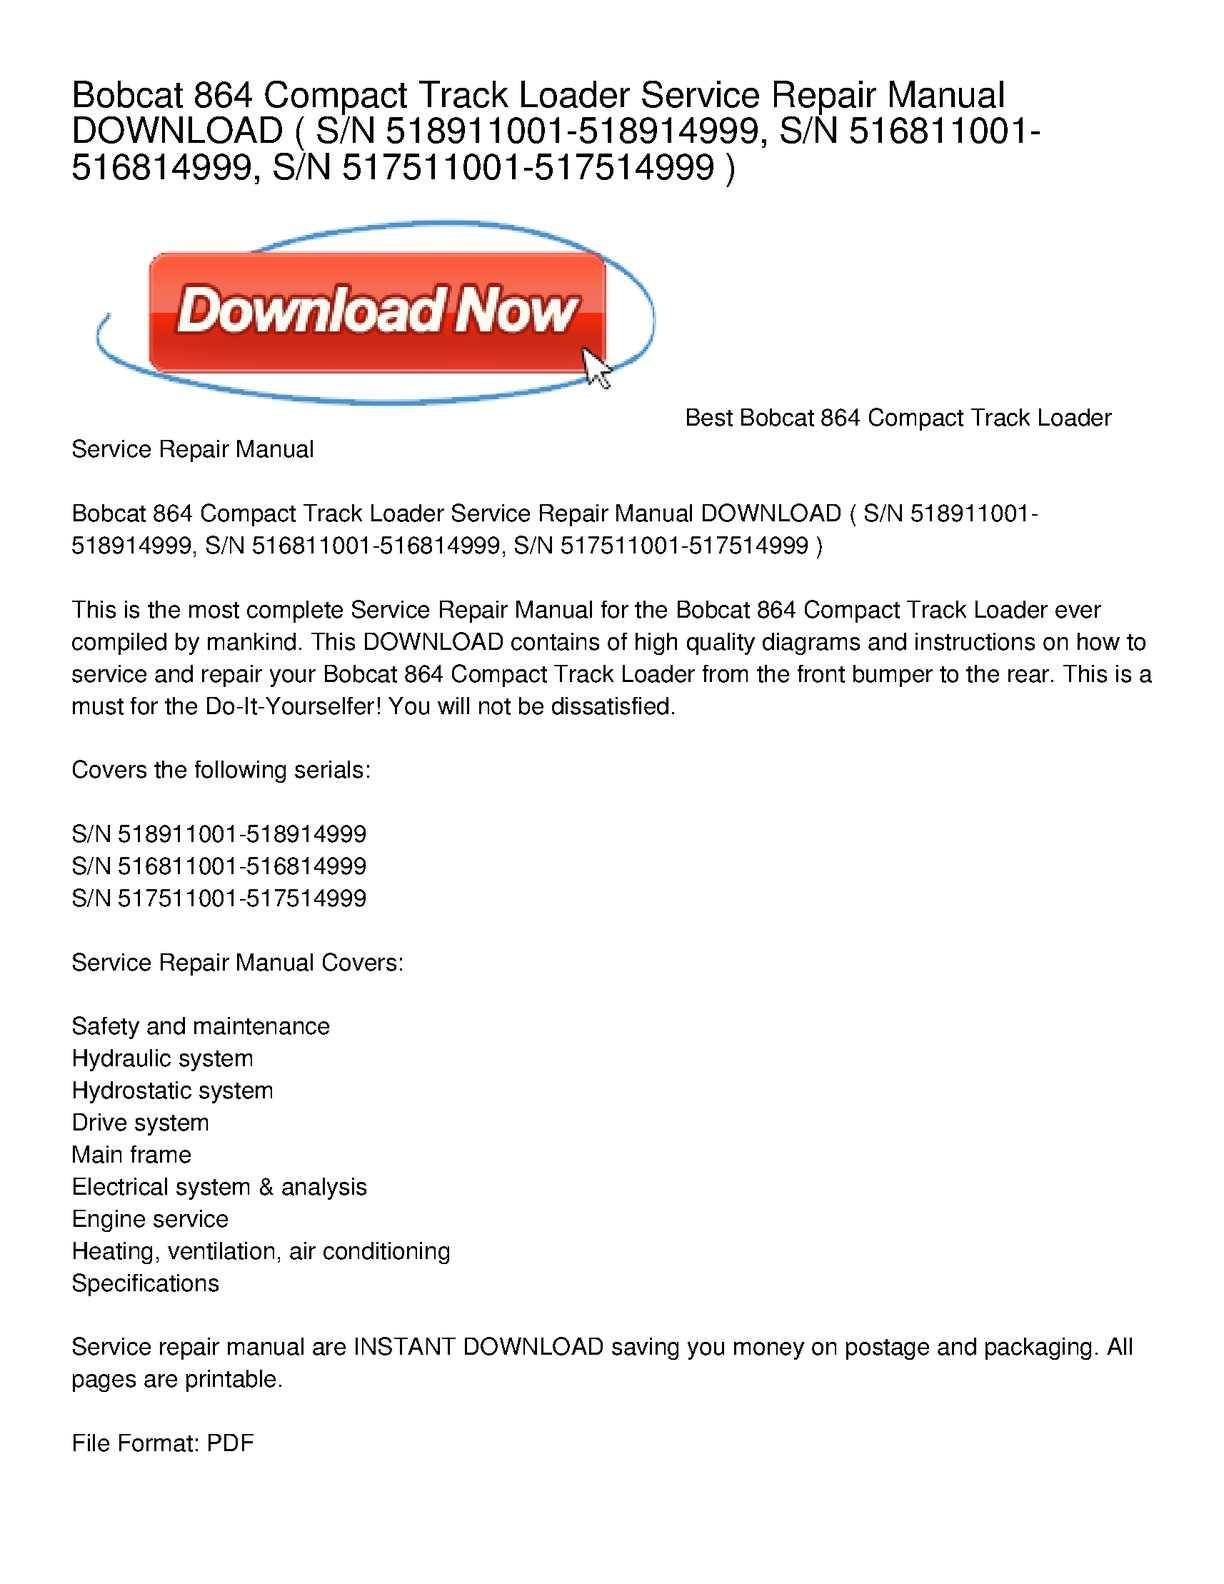 calam o bobcat 864 compact track loader service repair manual download rh calameo com Bobcat 864 Service Manual Bobcat 864 Service Manual